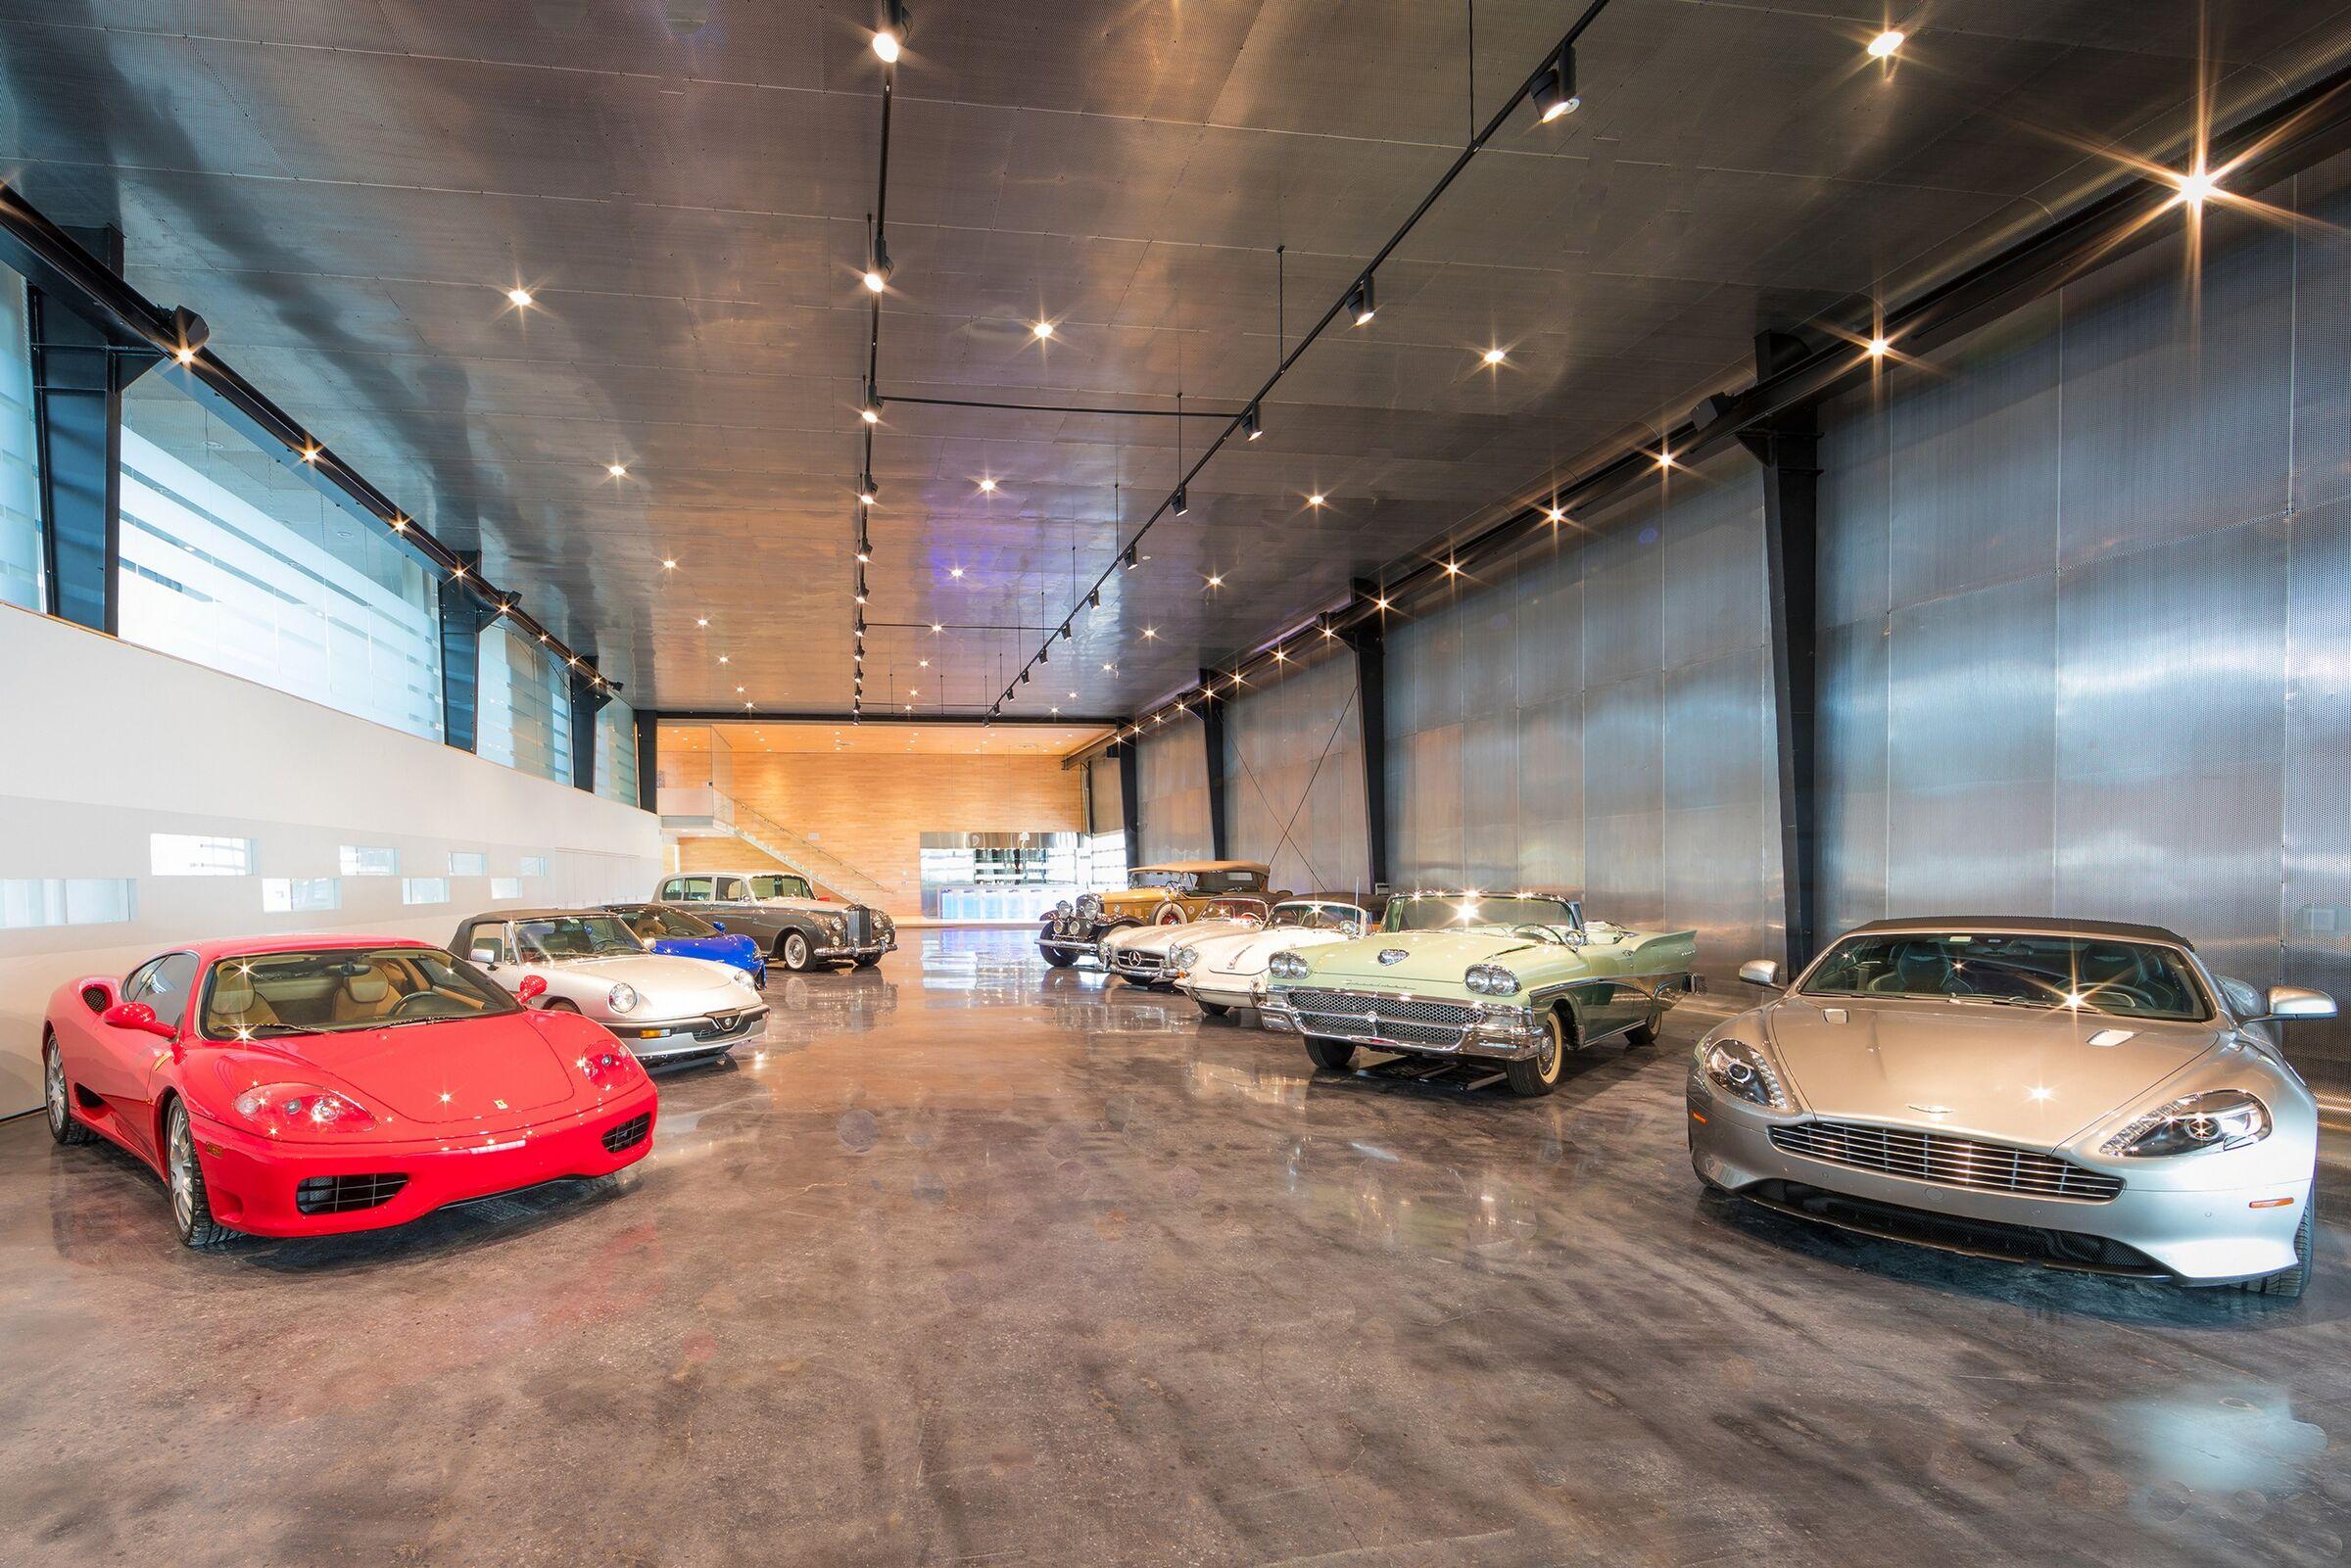 SouthEast Motors Brokers reviews | Car Brokers at 2949 Suffolk Dr - Fort Worth TX